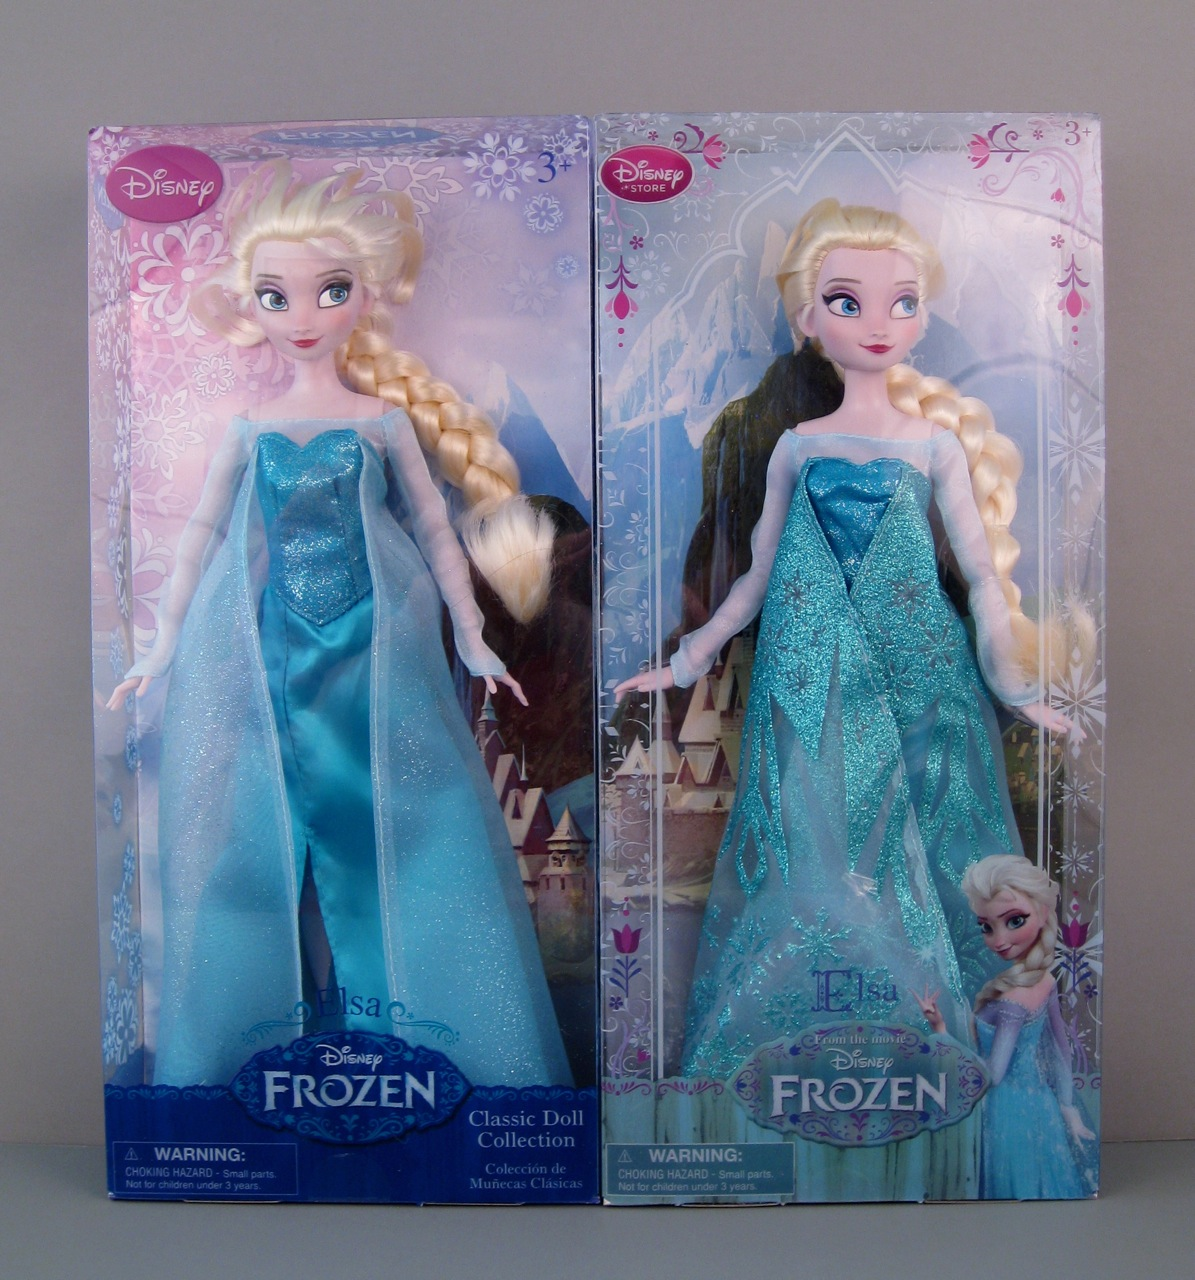 Elsa doll comparison